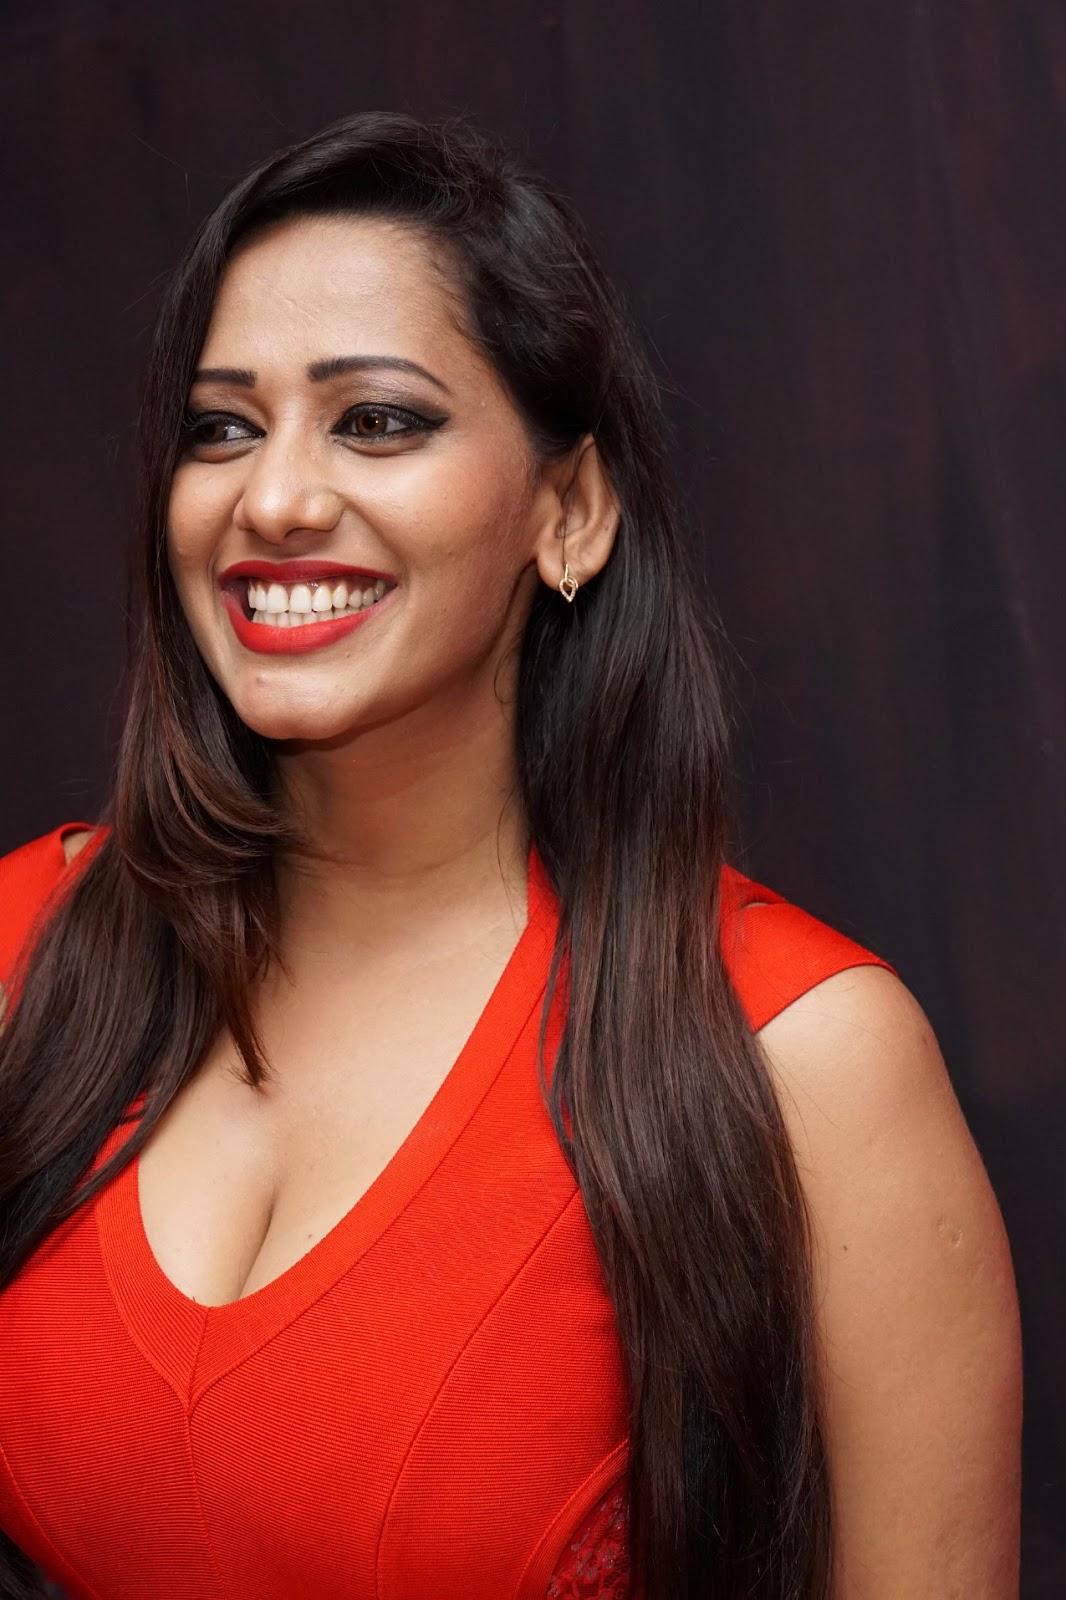 Beauty Galore HD : Hot Sanjana Singh Big Cleavage In Red Dress